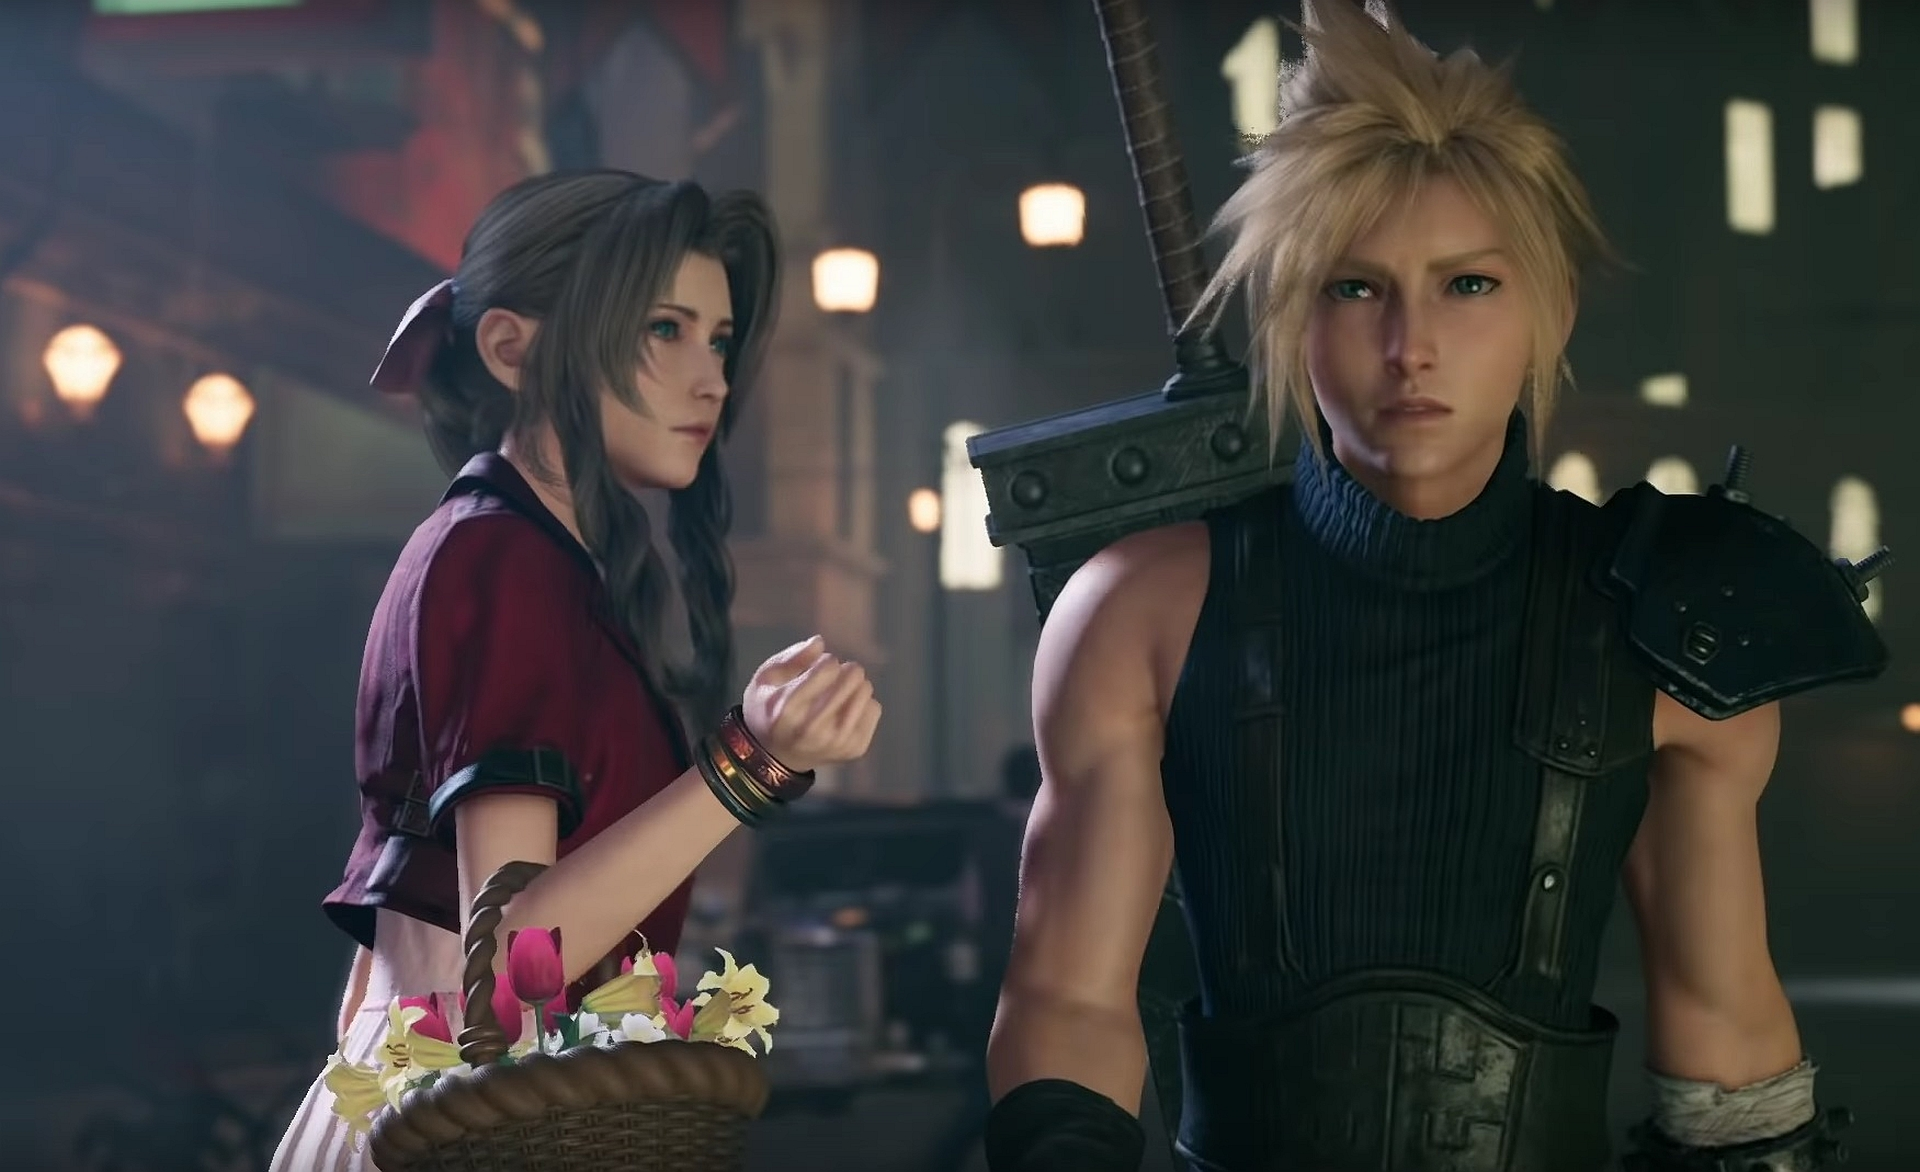 Square Enix denies takeover rumors